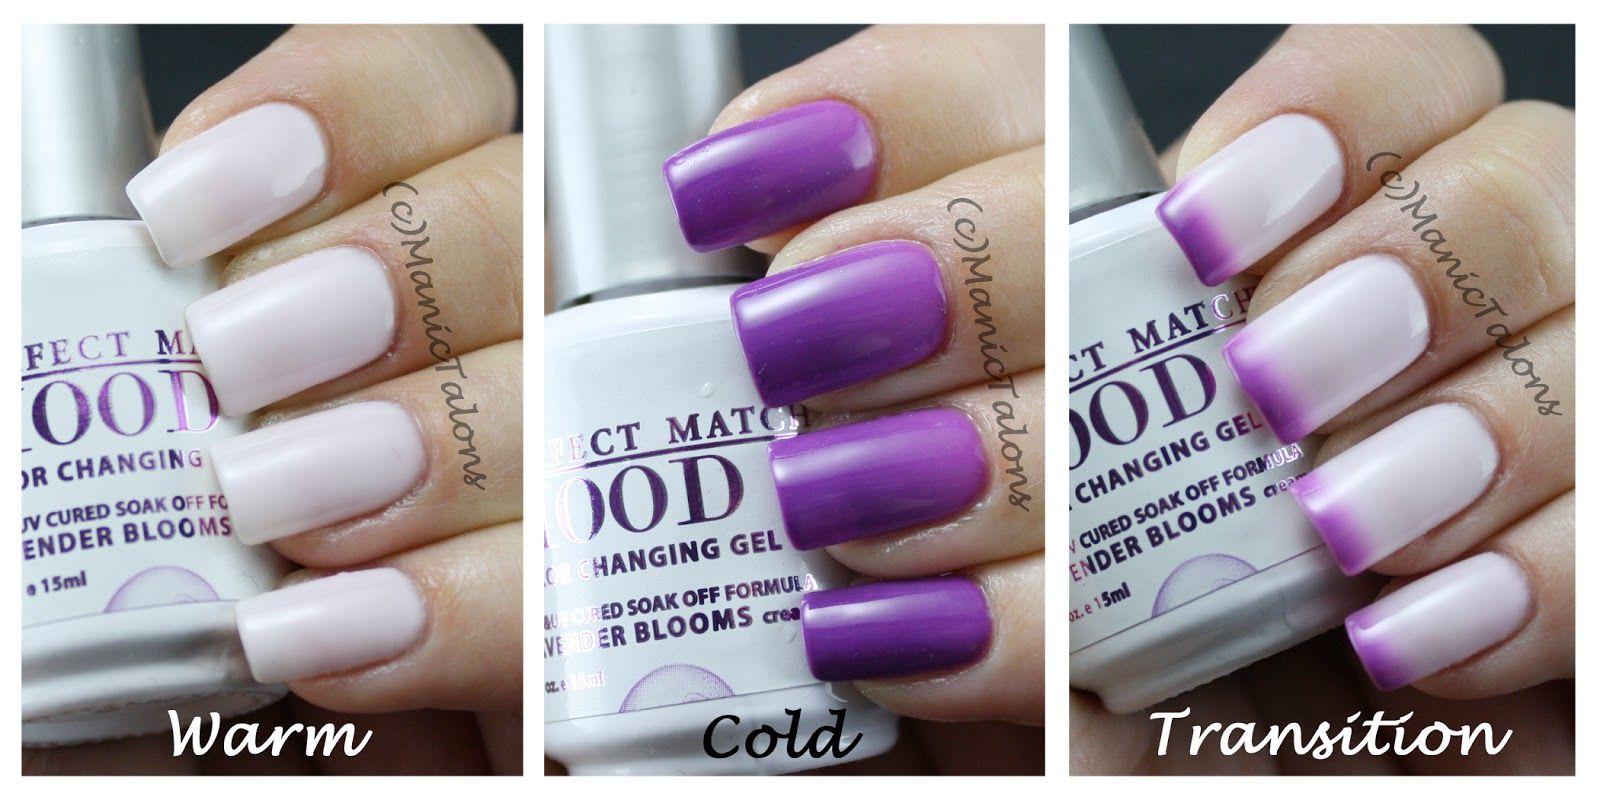 LeChat Mood Lavender Blooms Swatch